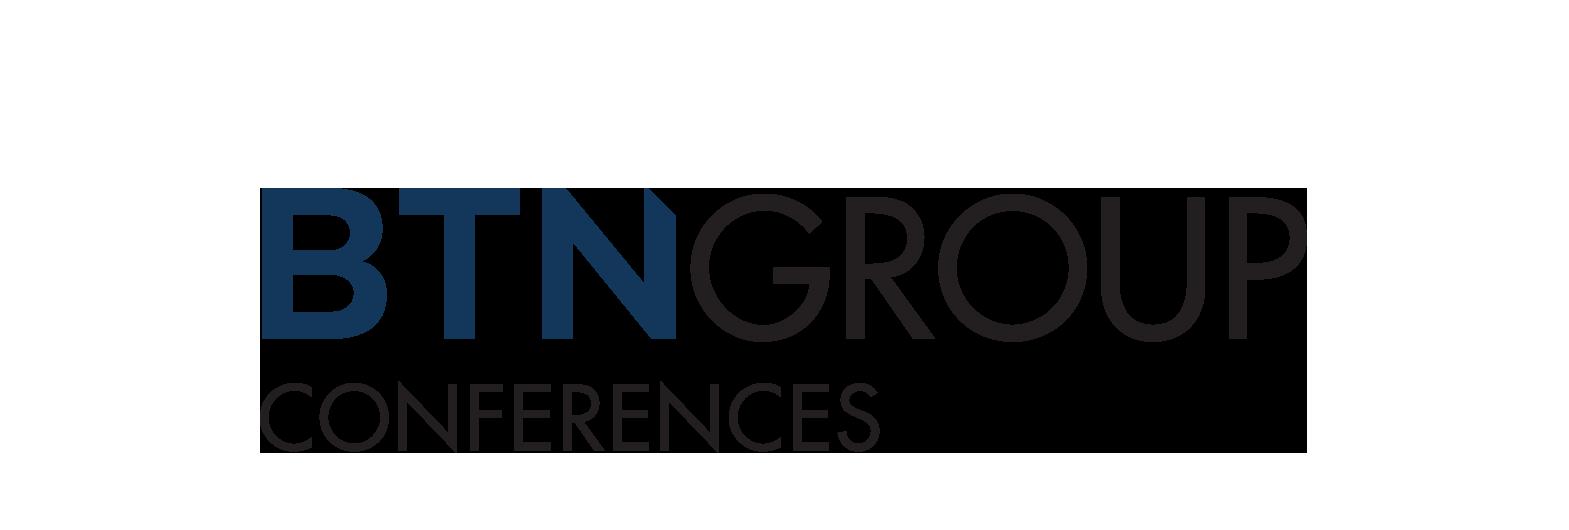 BTNG_Conferences